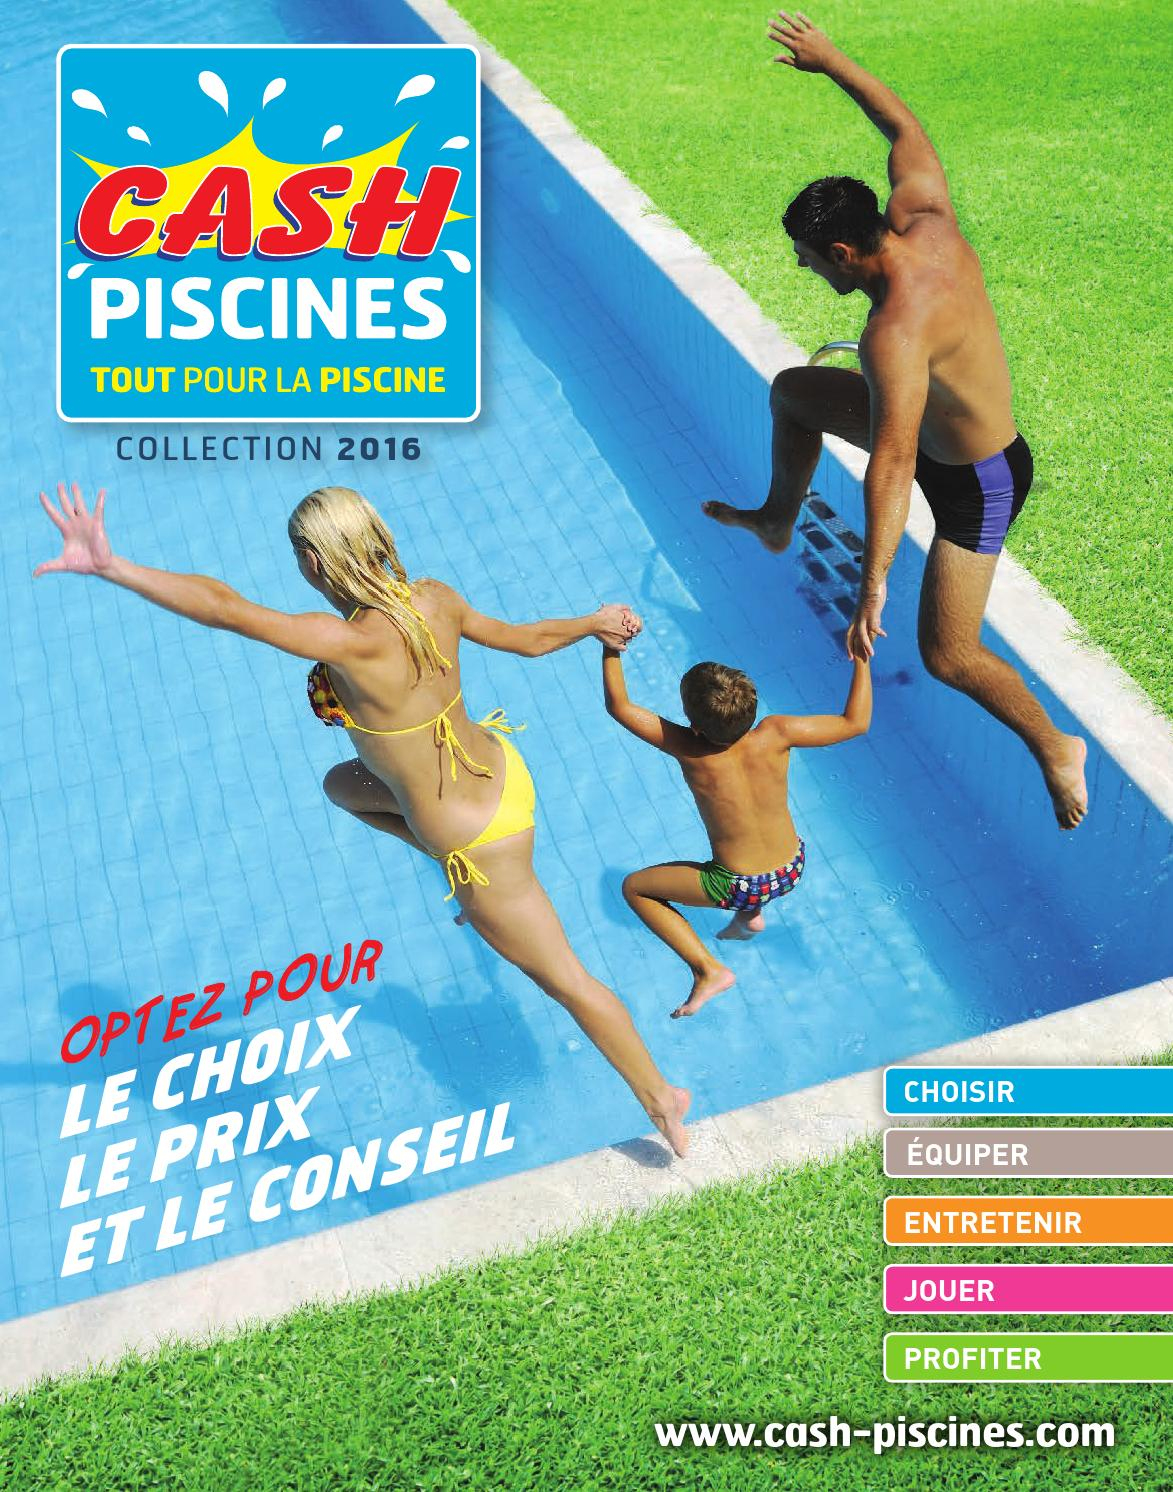 Cash Piscines 2016 By Octave Octave - Issuu encequiconcerne Cash Piscine Venelles